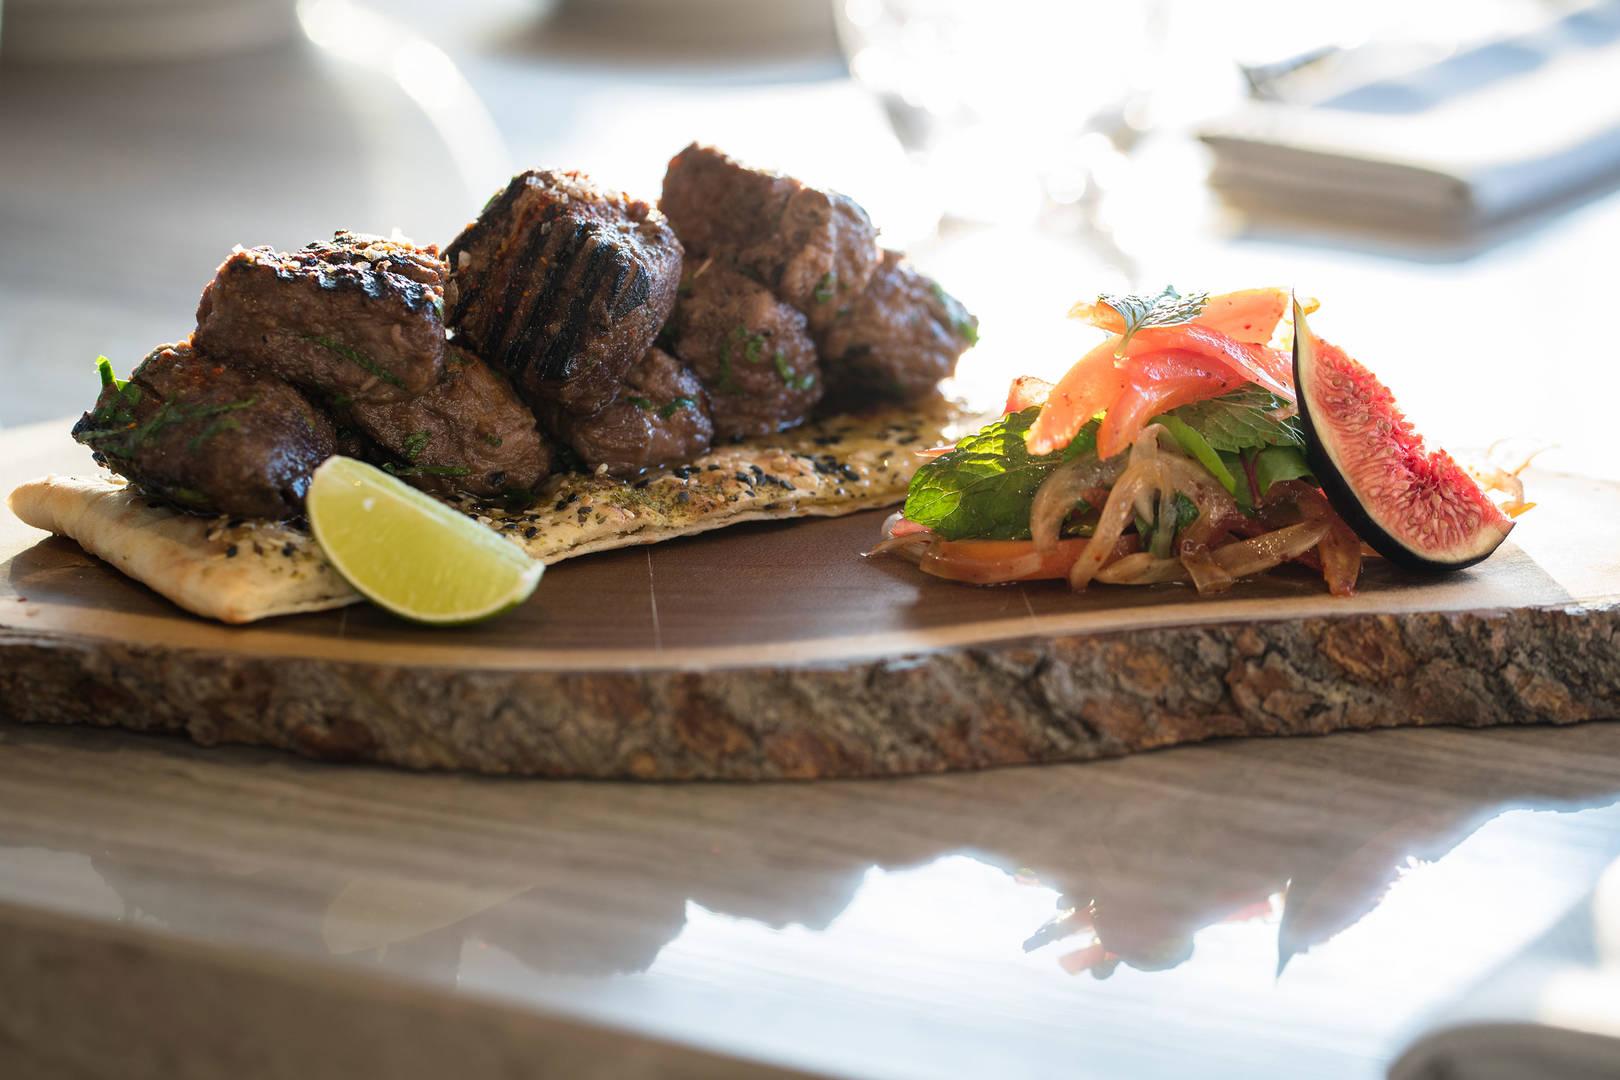 https://cdn.jumeirah.com/-/mediadh/DH/Hospitality/Jumeirah/Restaurants/Abu-Dhabi/Saadiyat-Island-Resort-Tean/Restaurant-Gallery/JumeirahatSaadiyatIslandResortTeanFood164.jpg?h=1080&w=1620&hash=E4AD075DE1A8A5B54A6480D0F3E22DE0